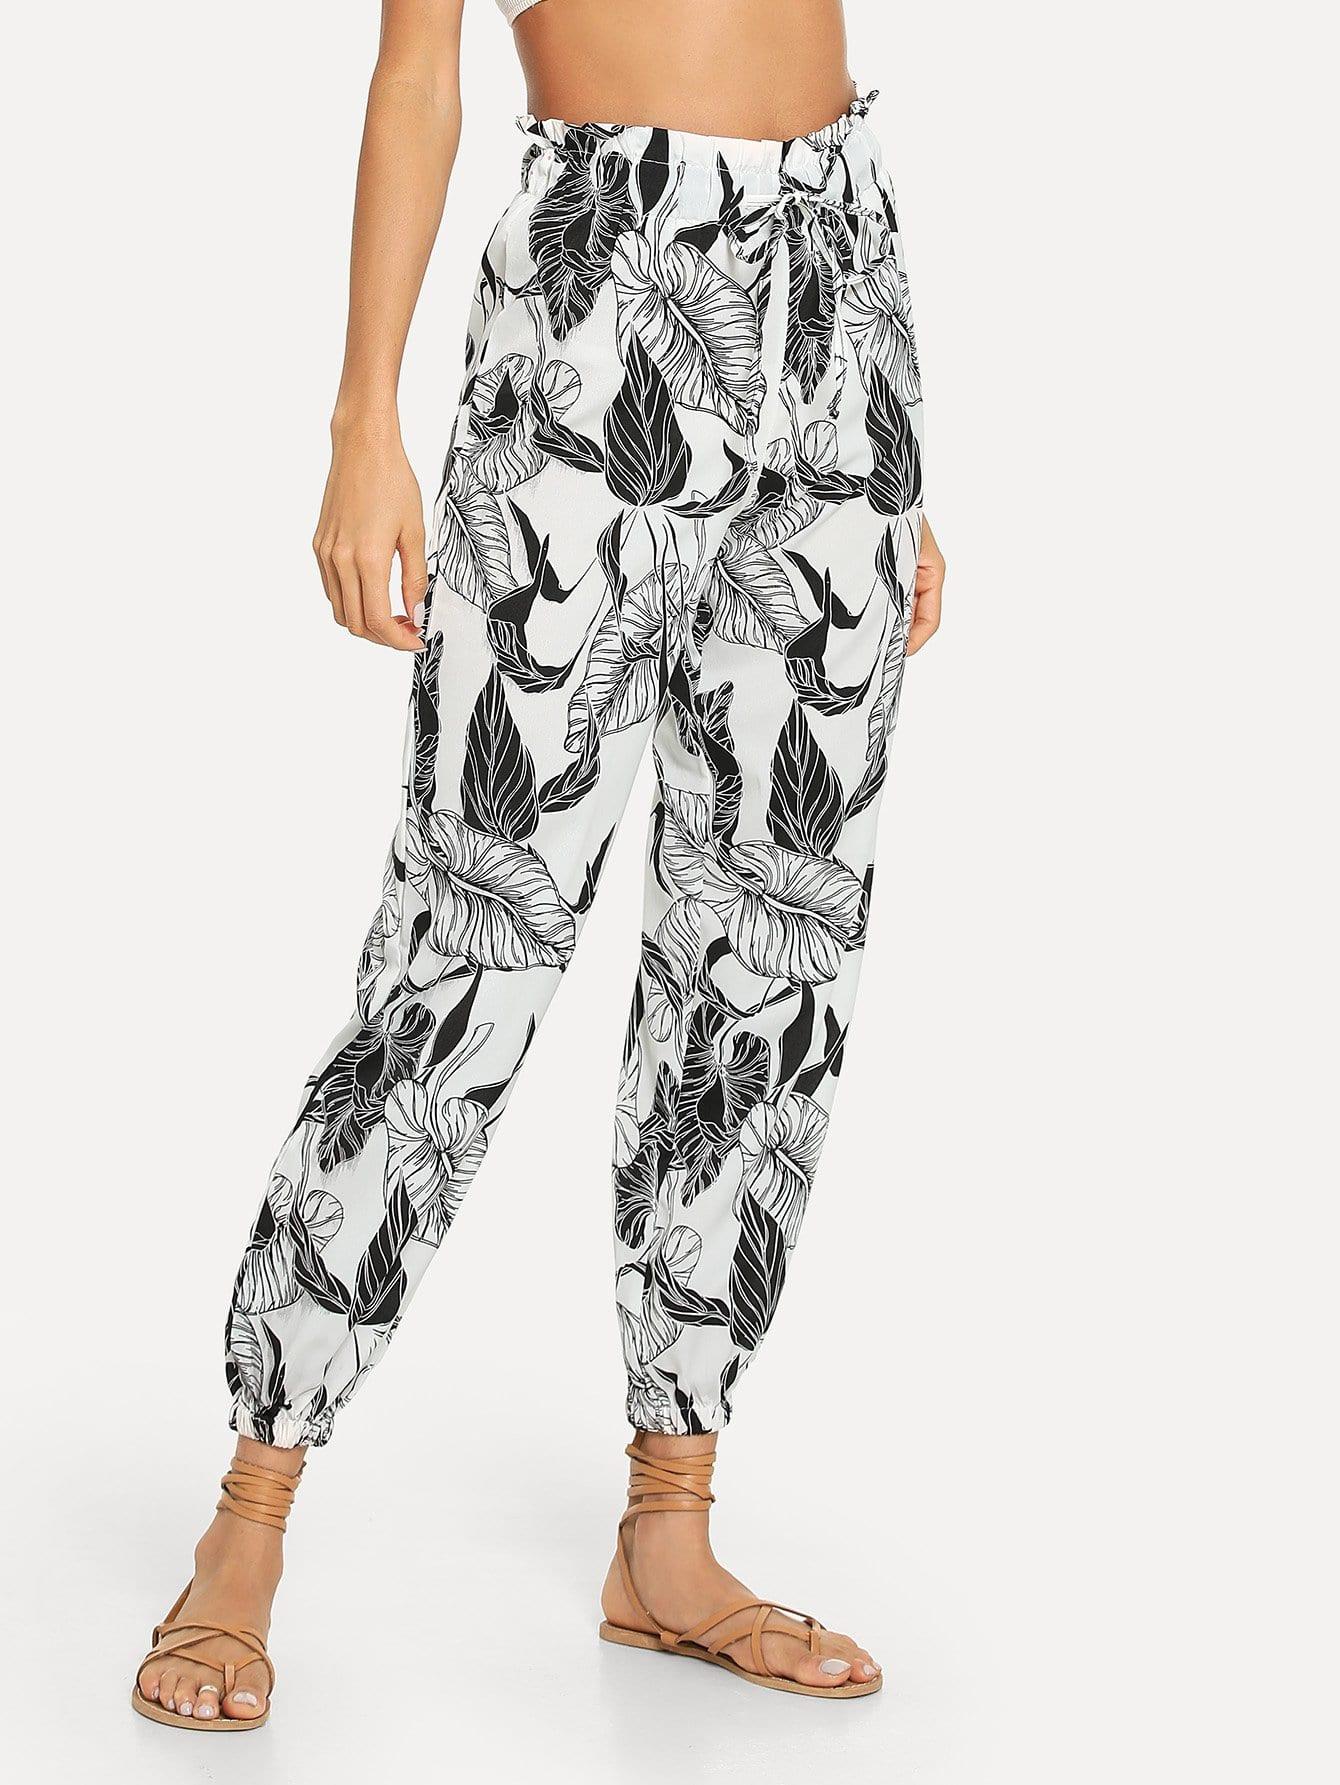 Drawstring Waist Leaf Print Pants